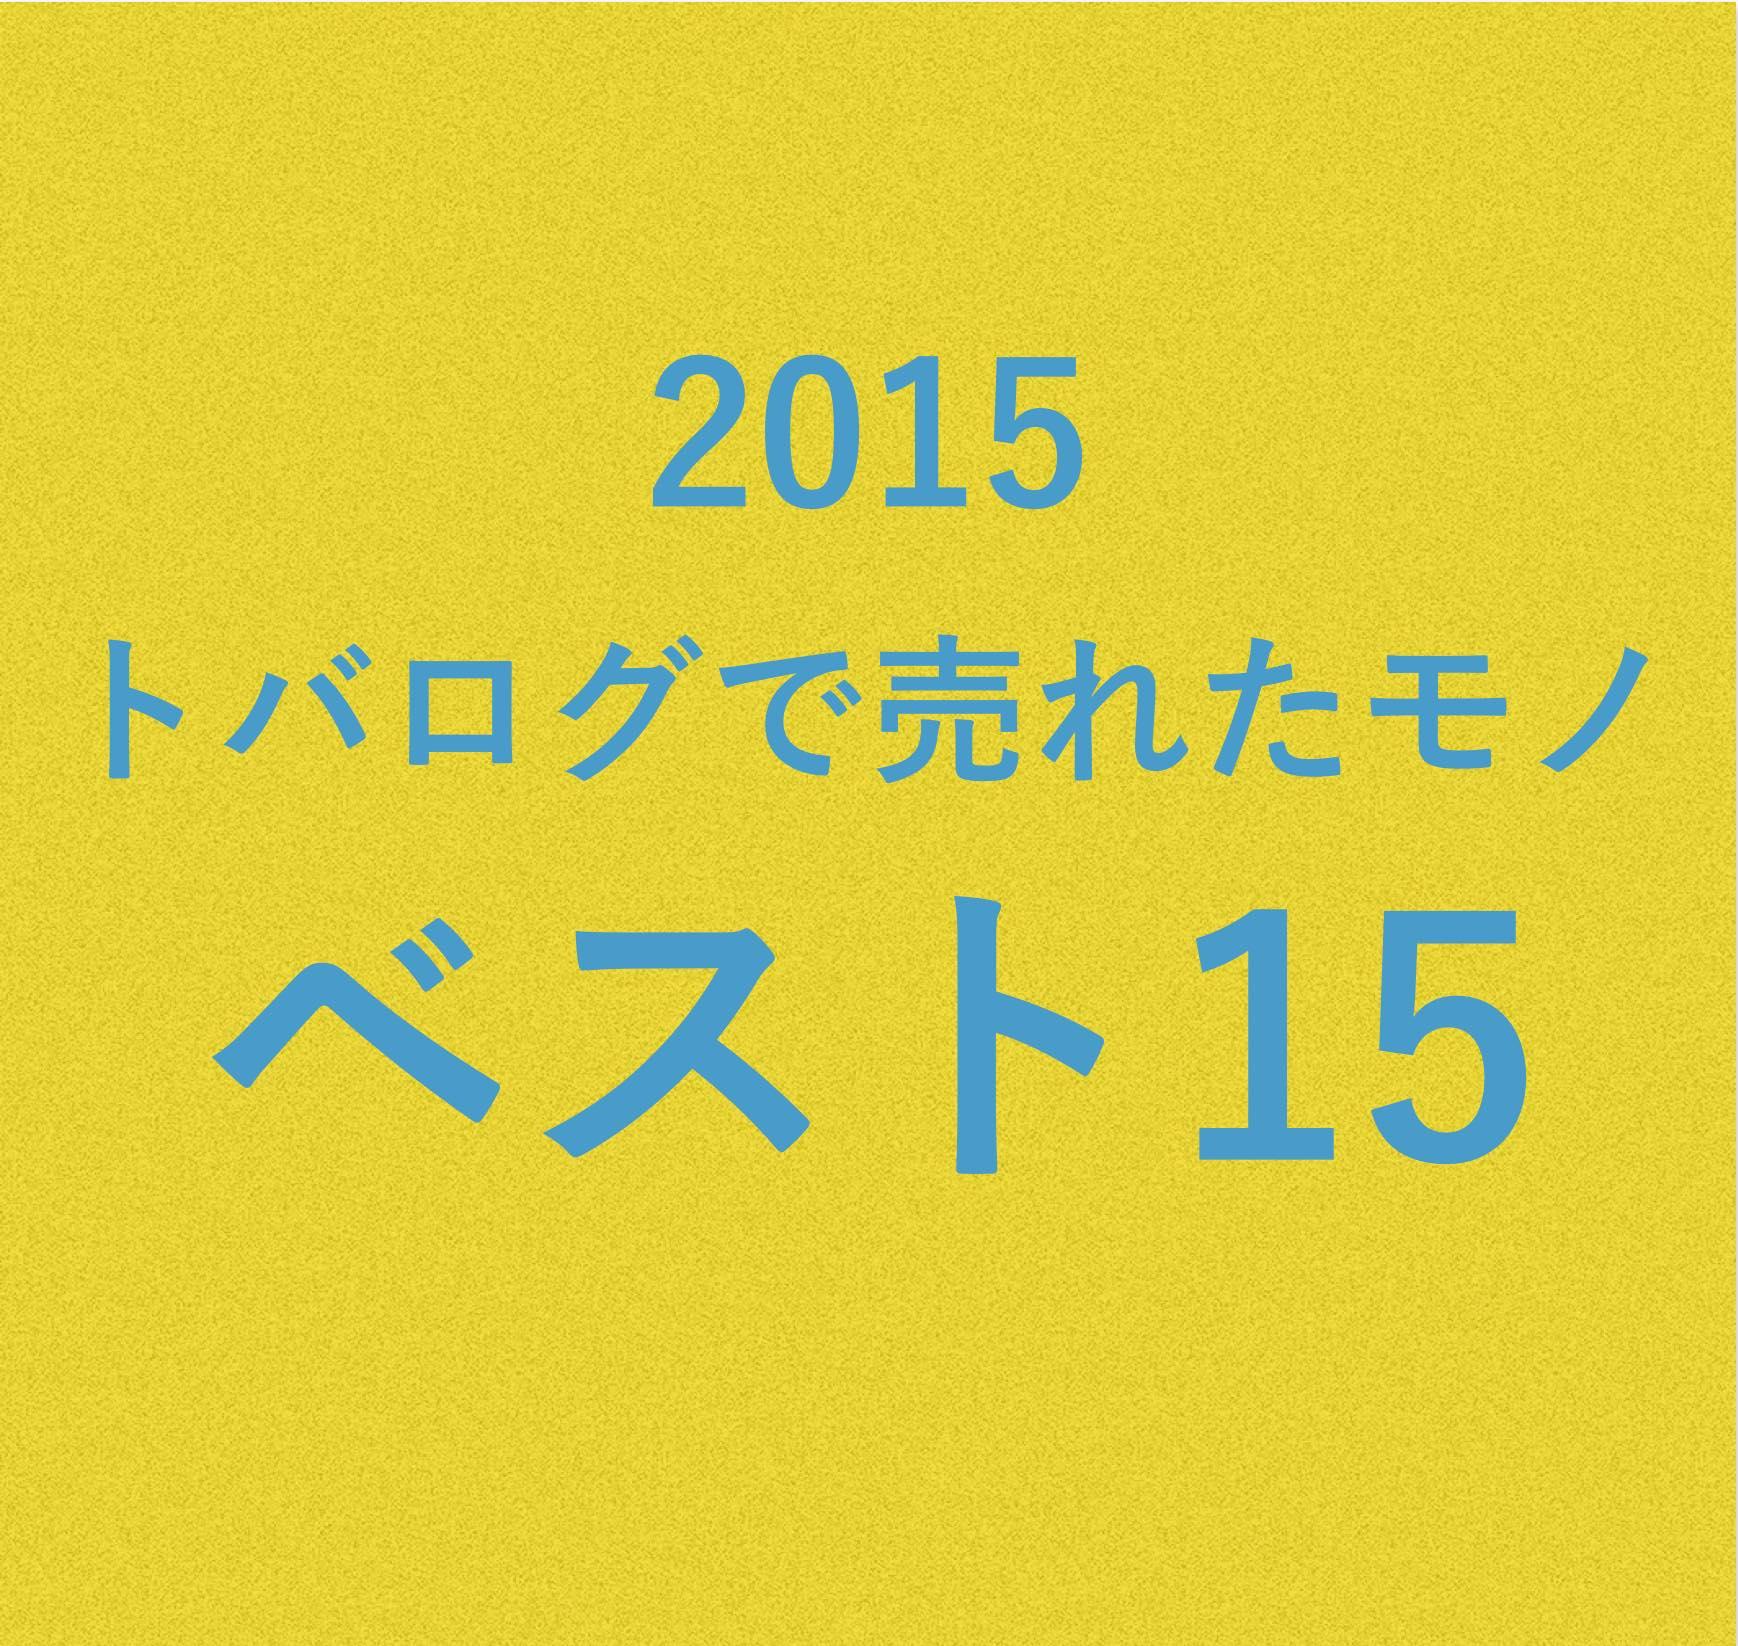 2015-best-pty